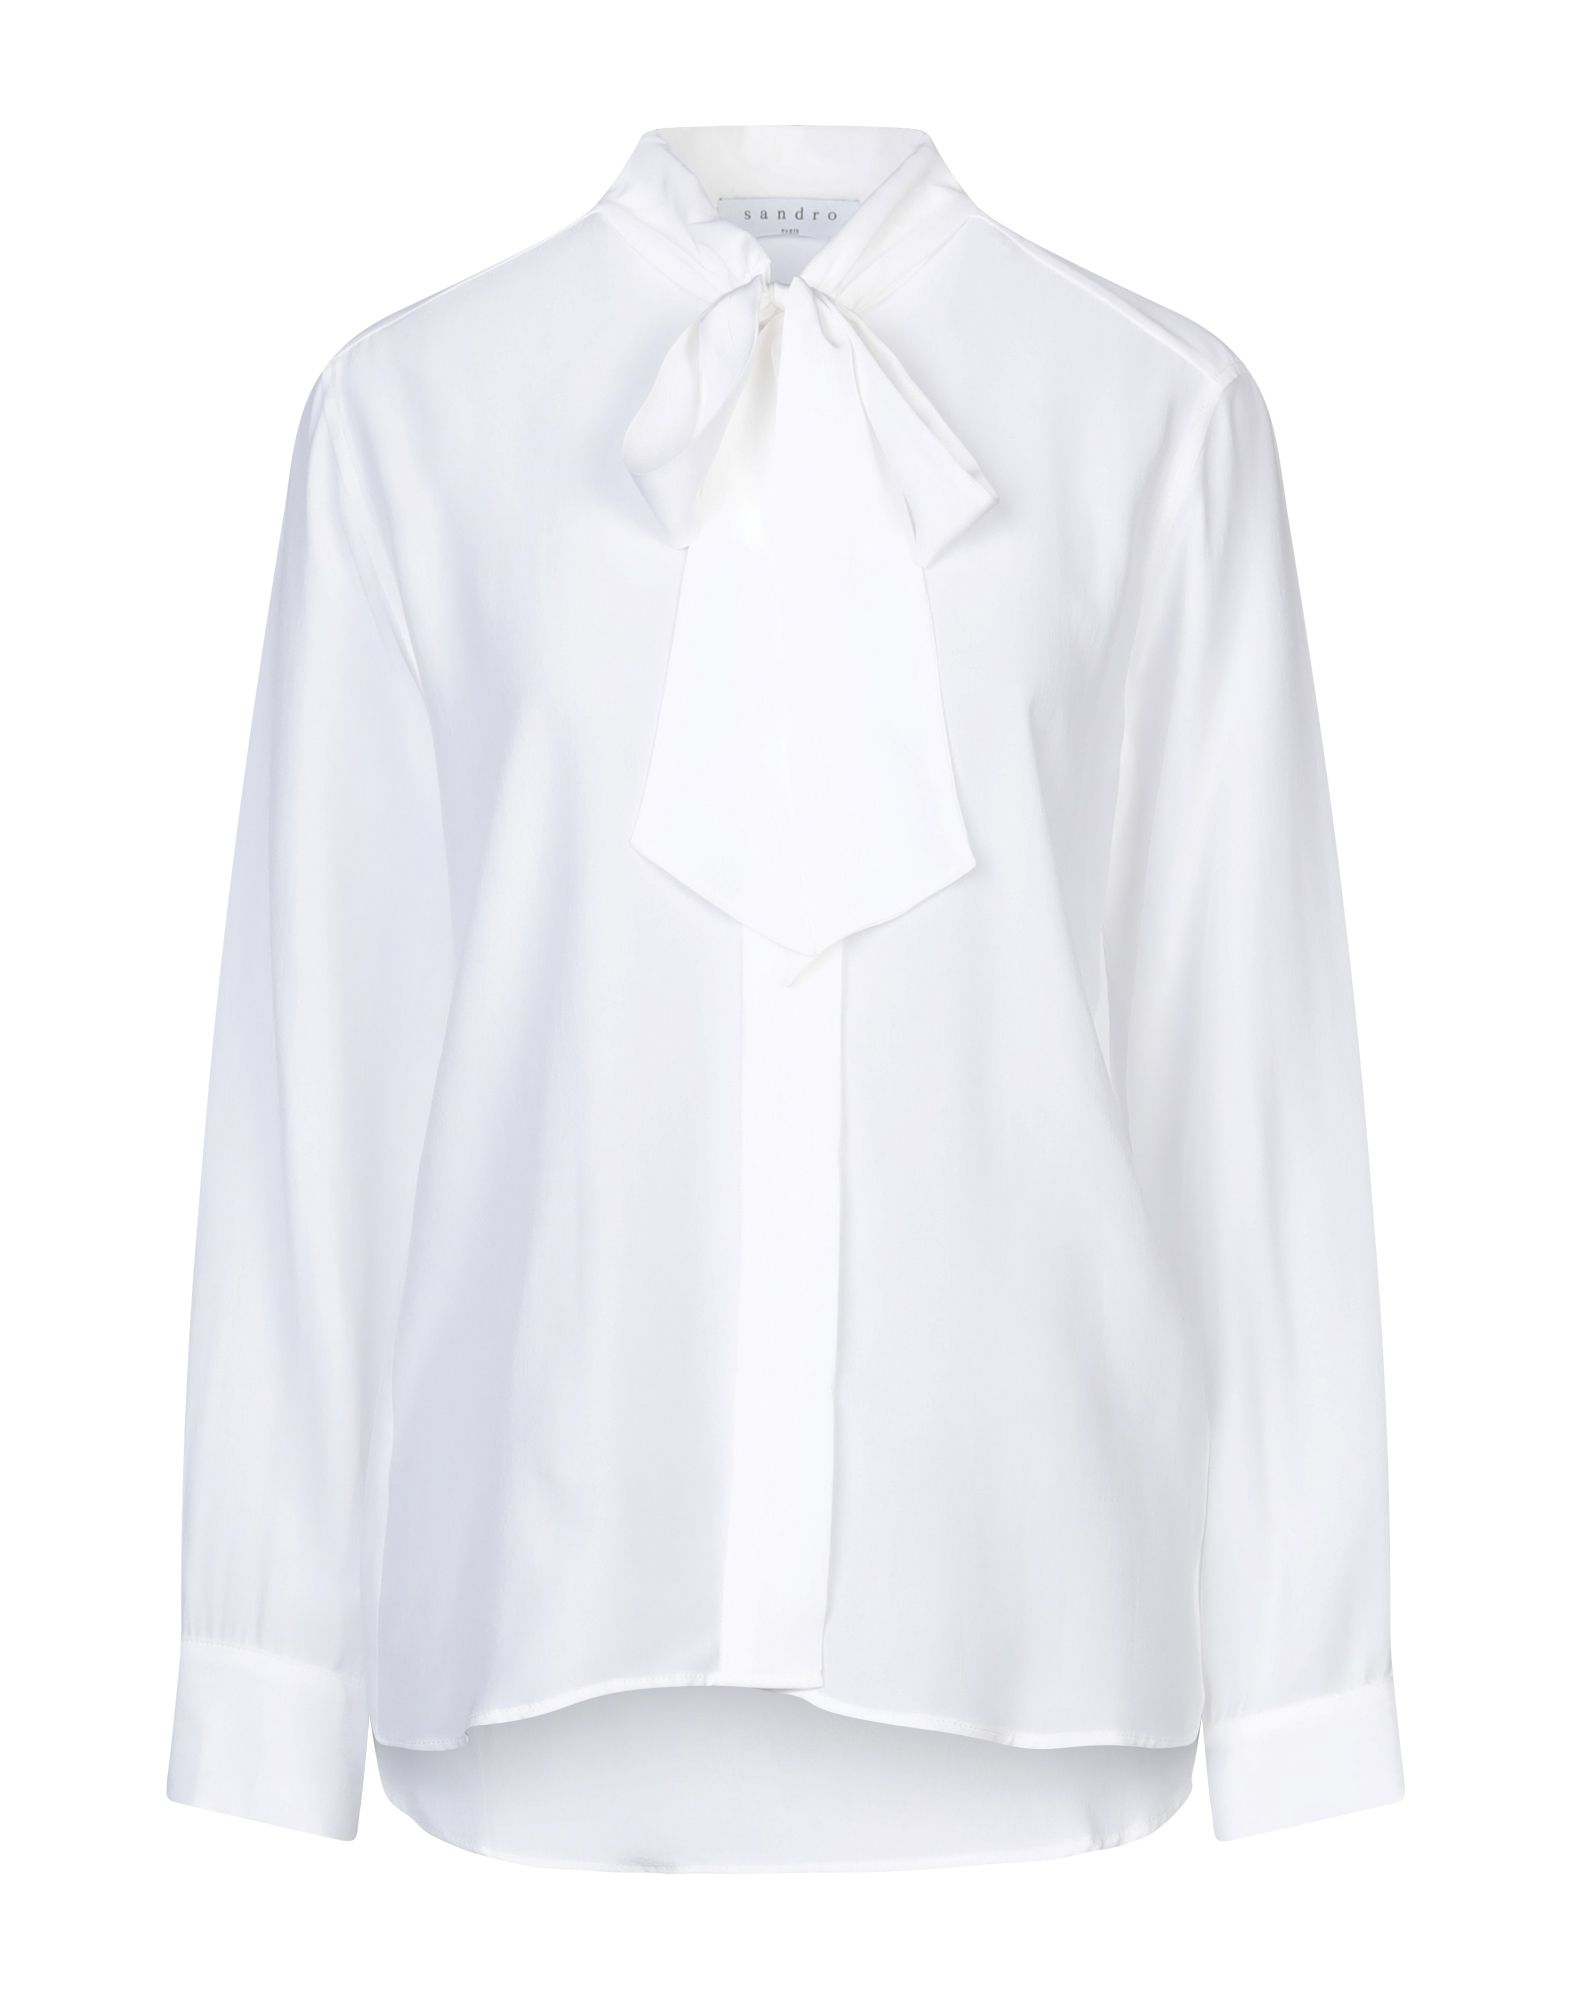 SANDRO 셔츠 - Item 38862674